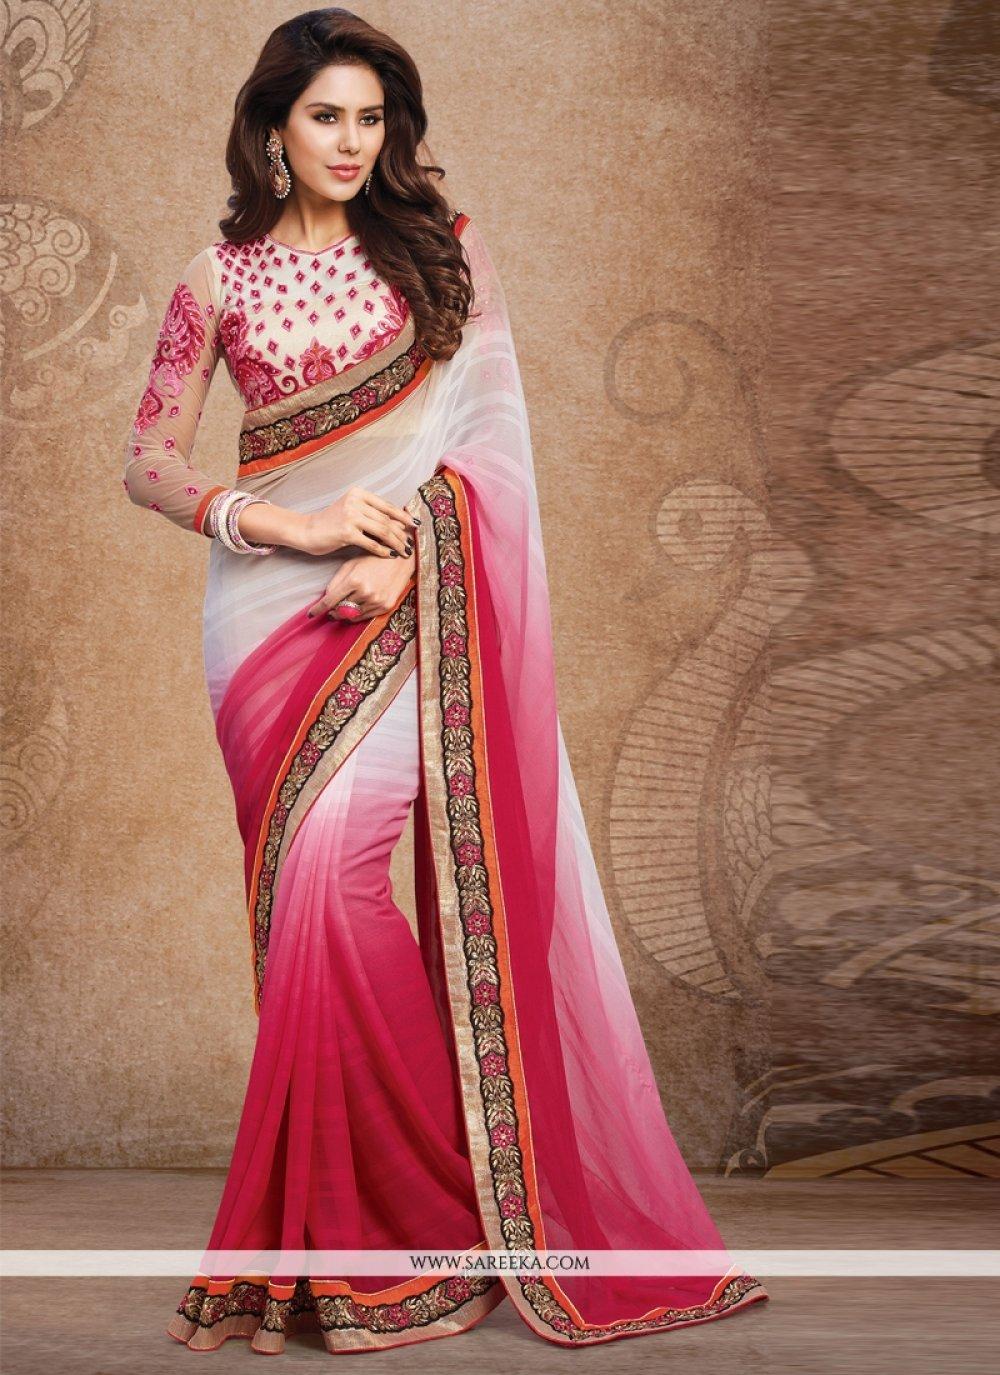 Faux Chiffon Pink and White Designer Saree